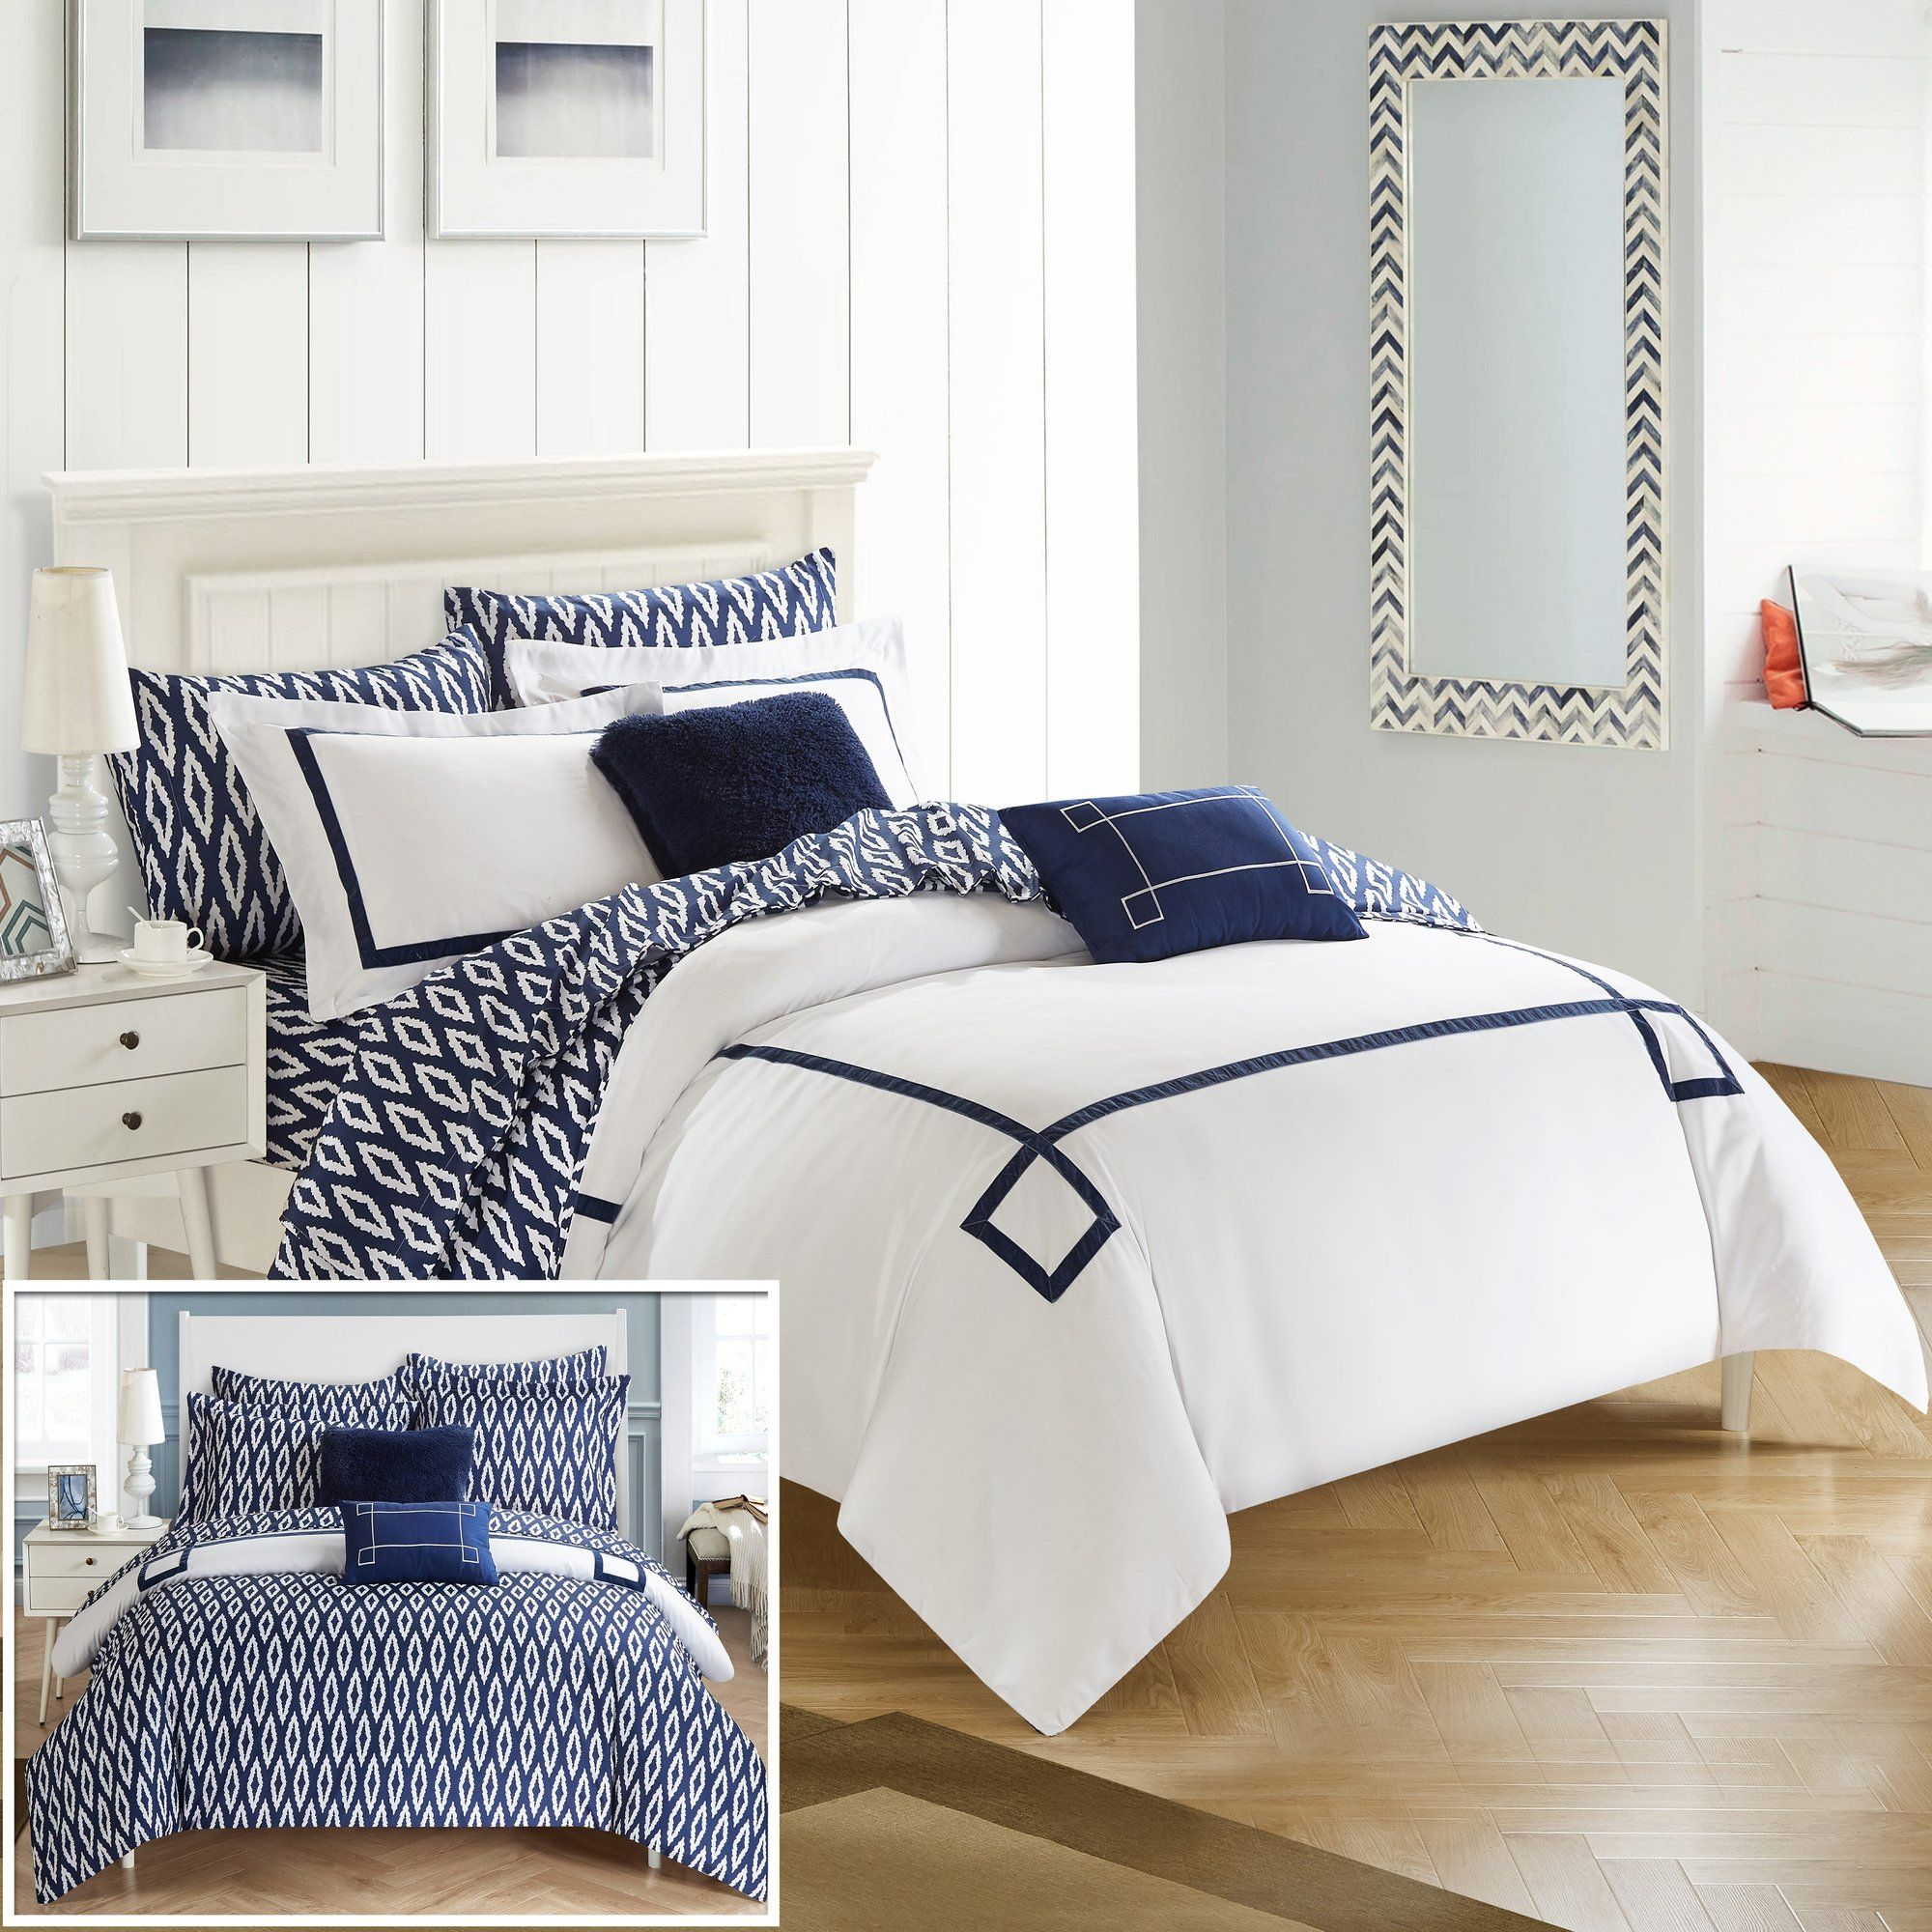 Trace Reversible Comforter Set Comforter sets